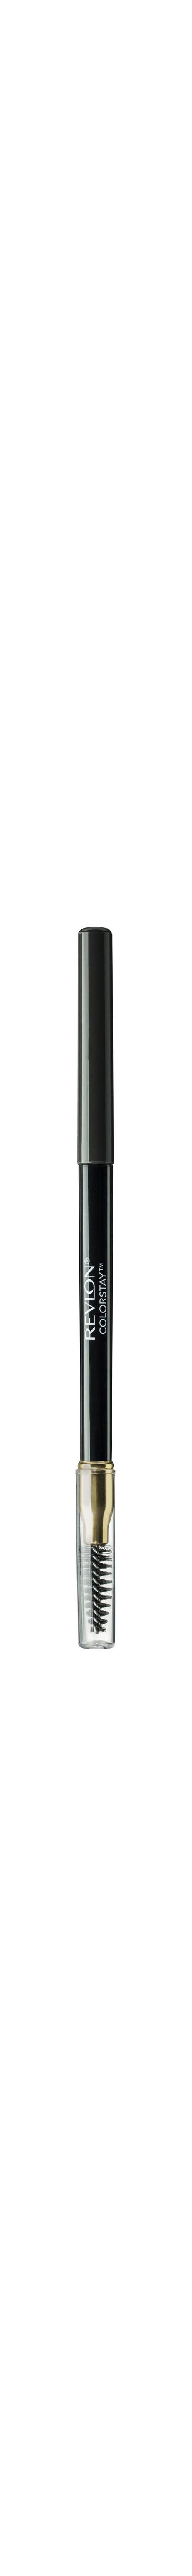 Revlon Colorstay™ Brown Pencil Soft Black